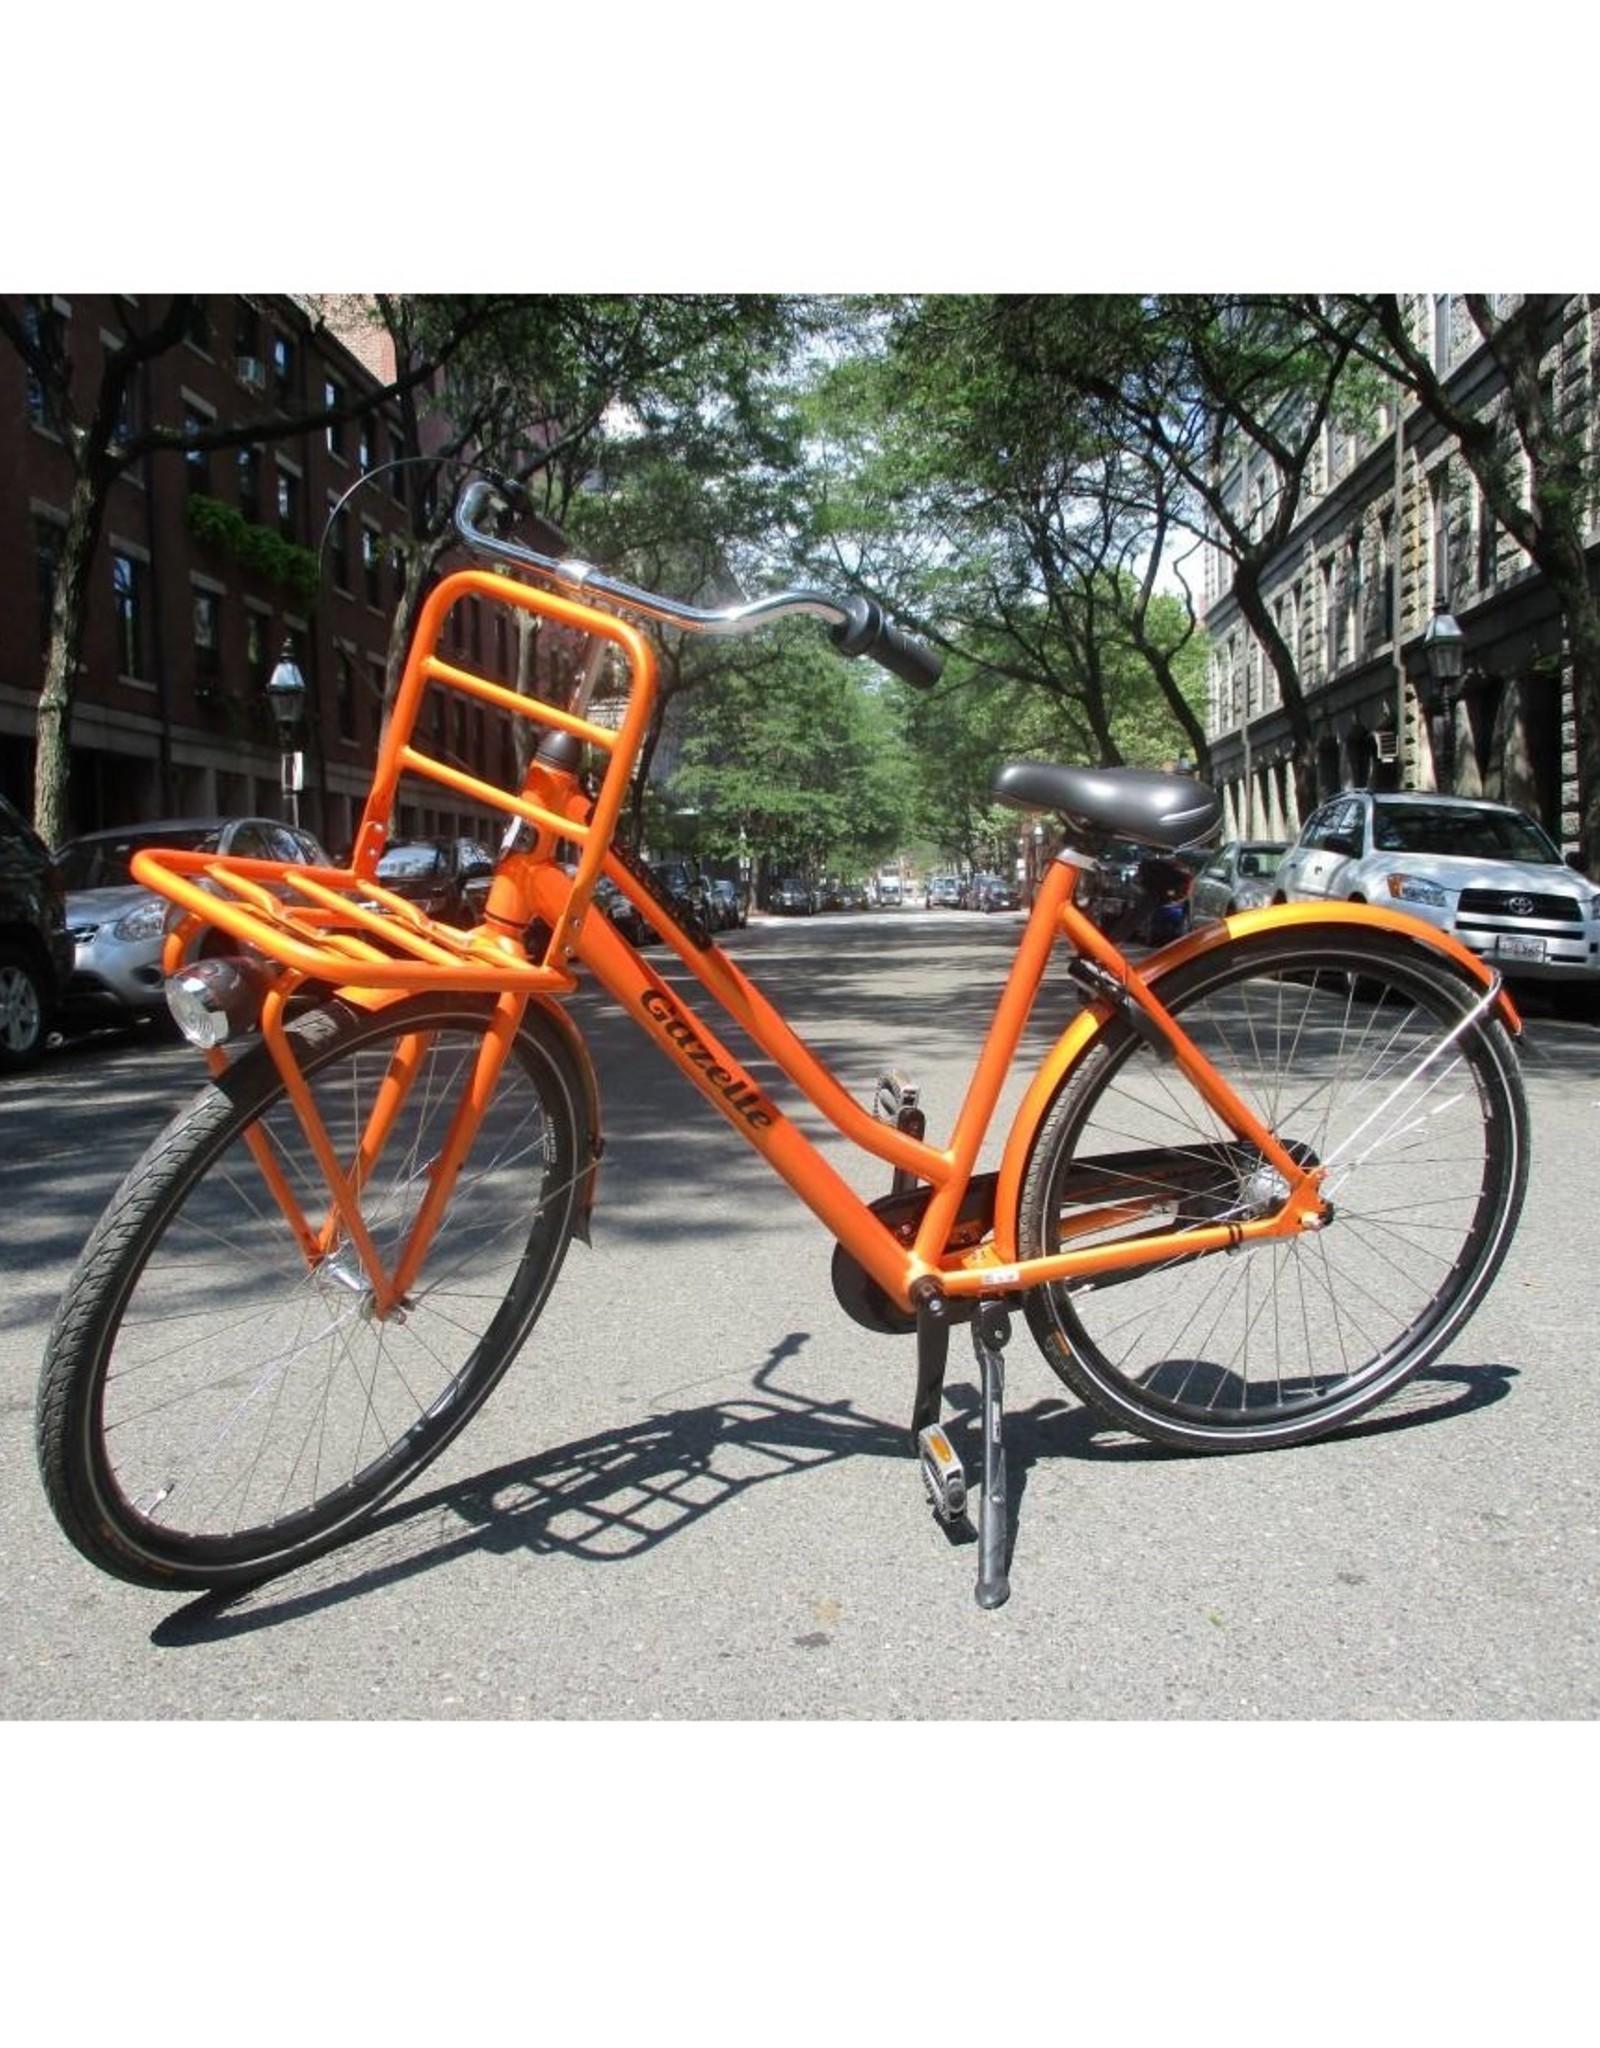 Gazelle Duty NL 3-Speed Bicycle